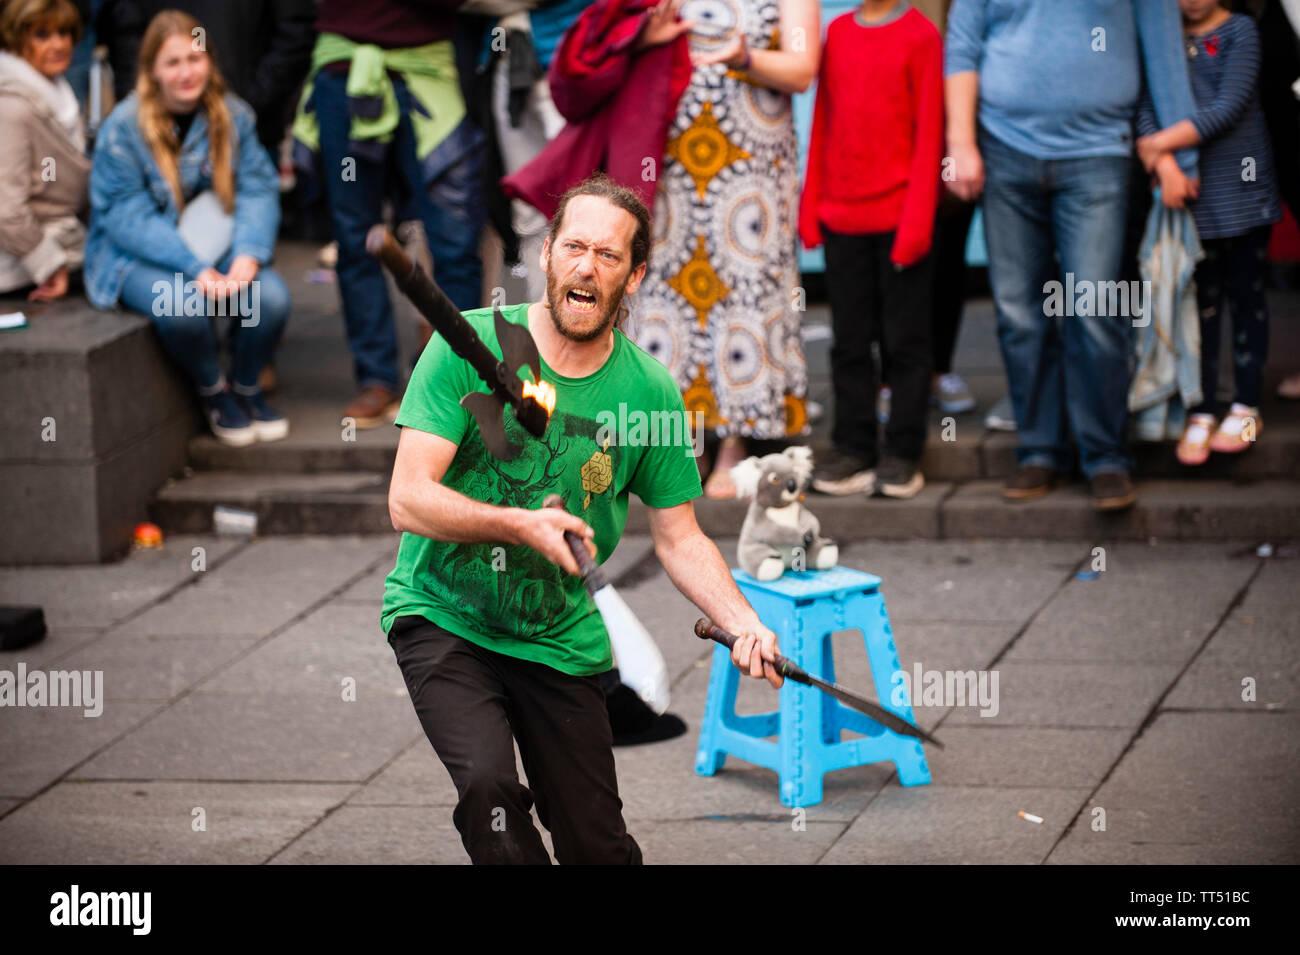 A street artist is performing during the Edinburgh Fringe festival. - Stock Image